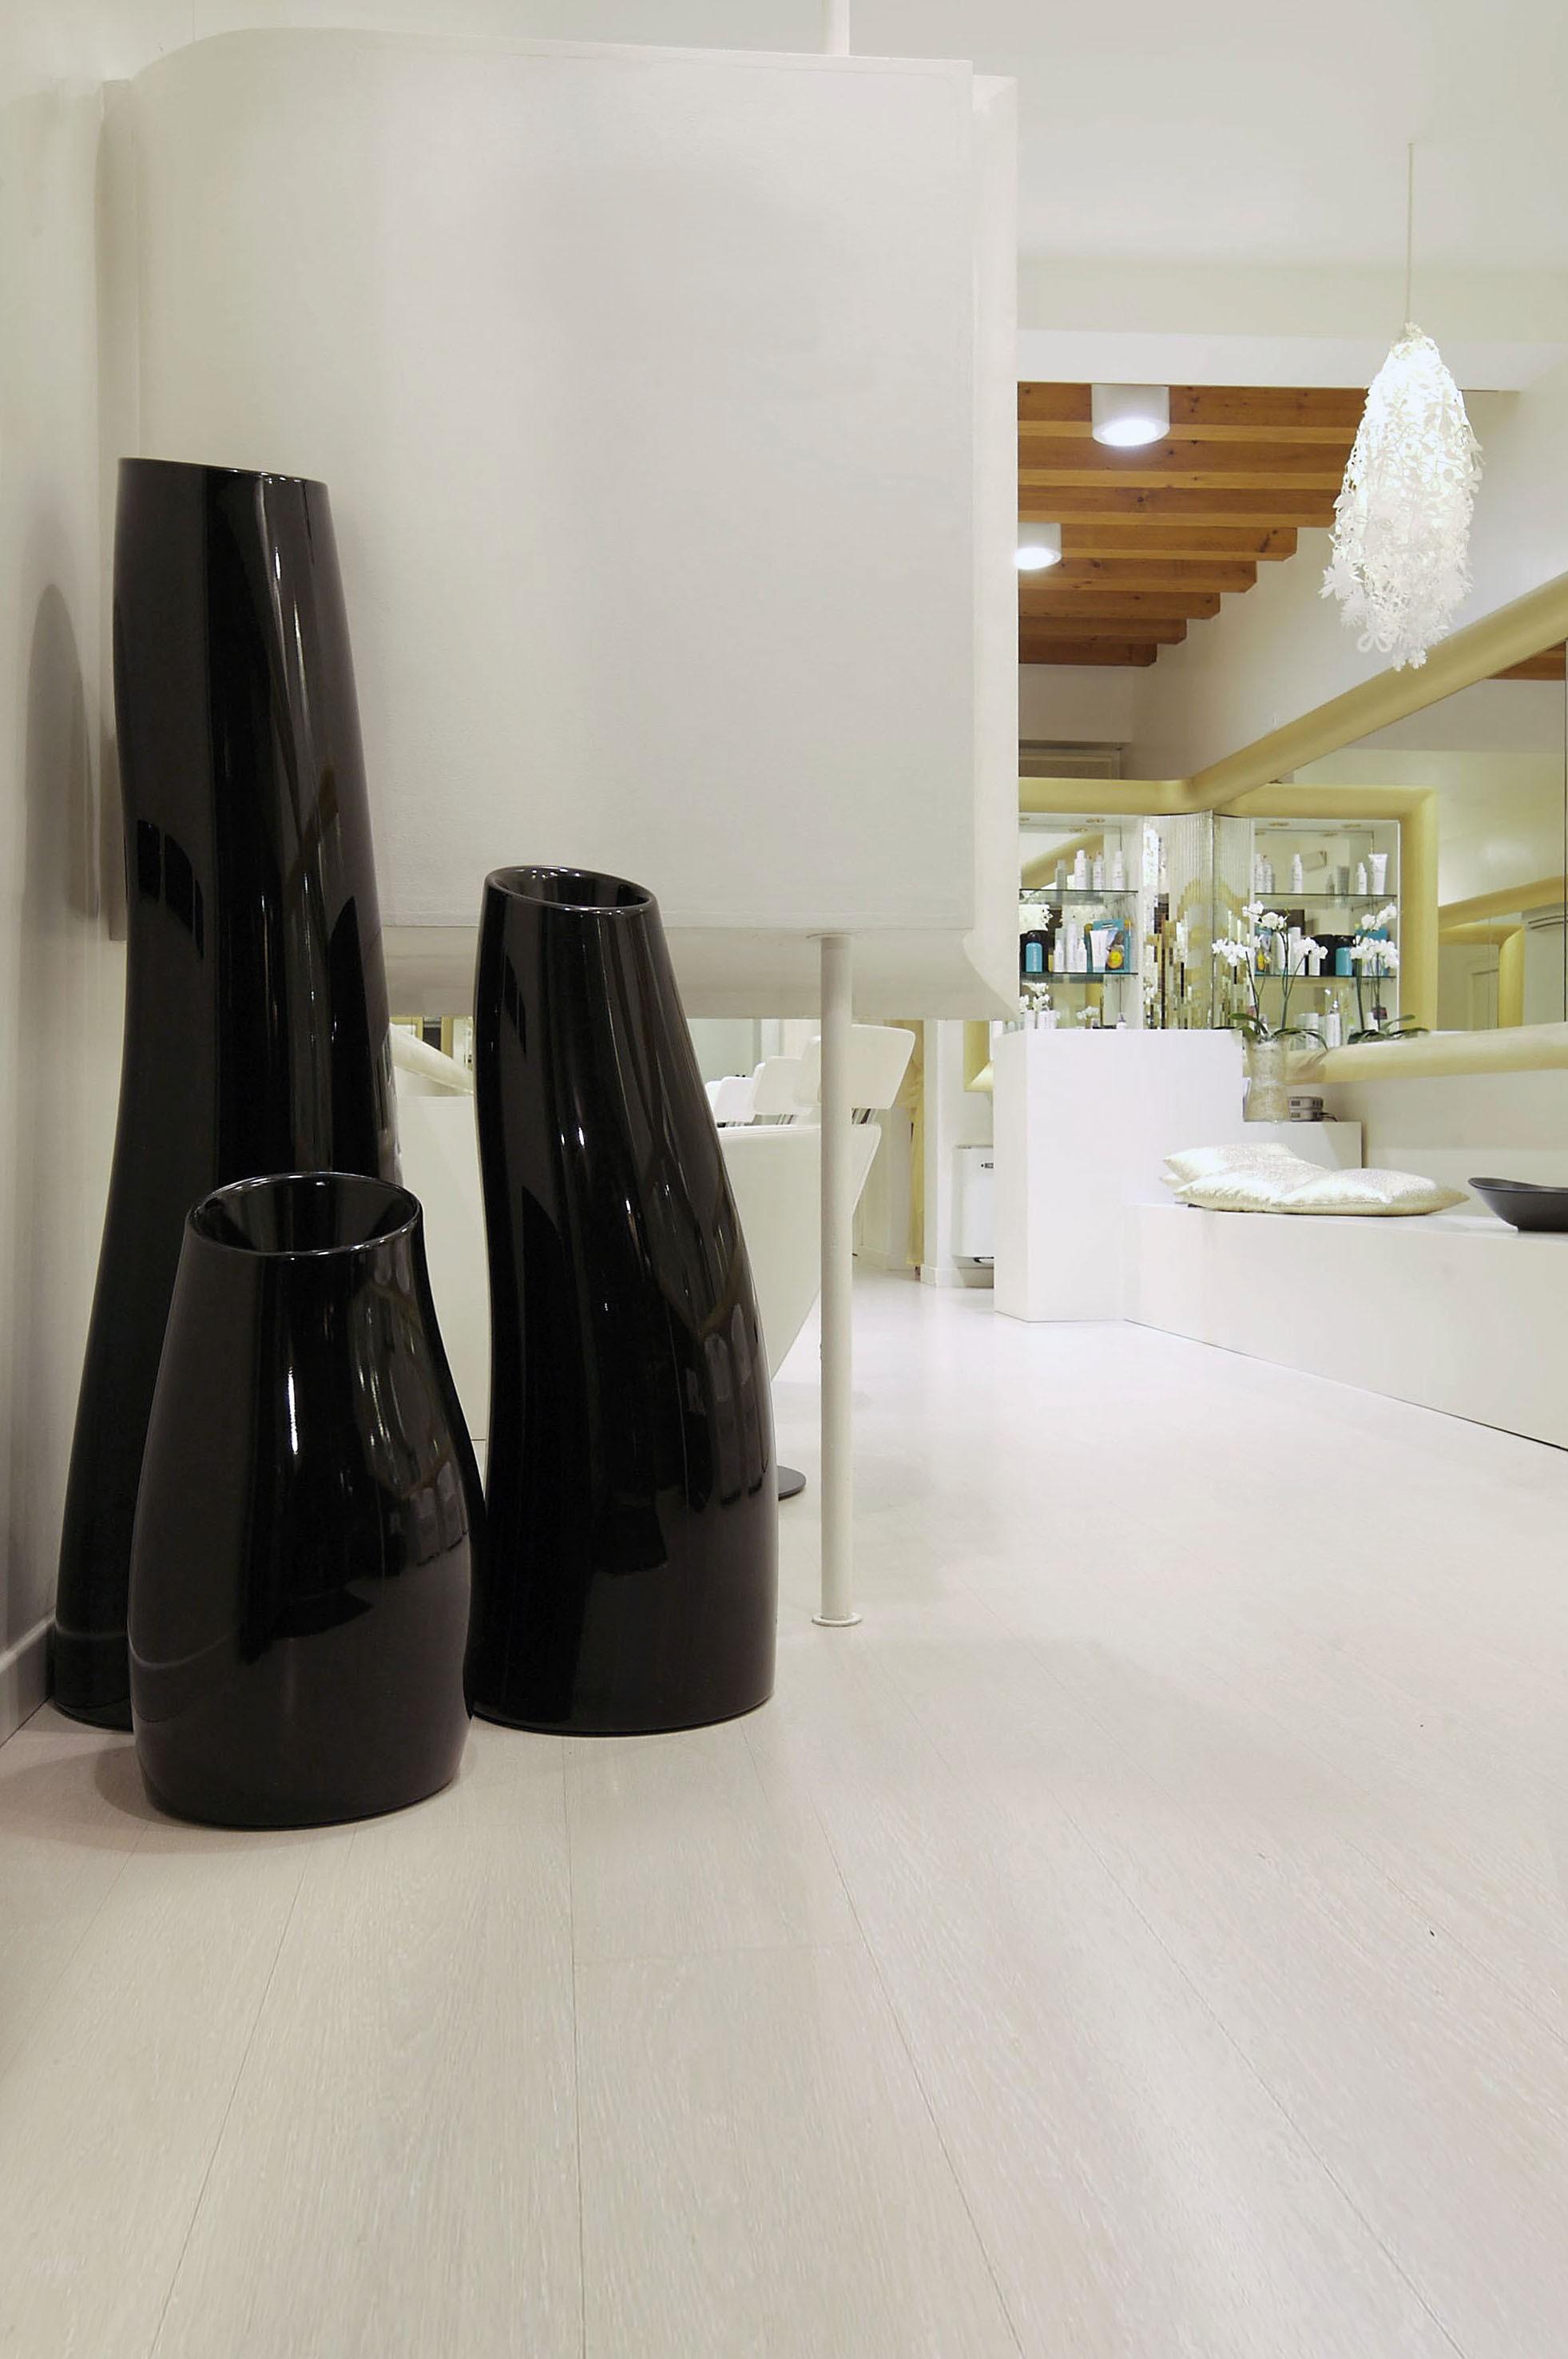 Vasi moderni da arredo vasi da giardino moderni in resina - Vasi per interni moderni ...